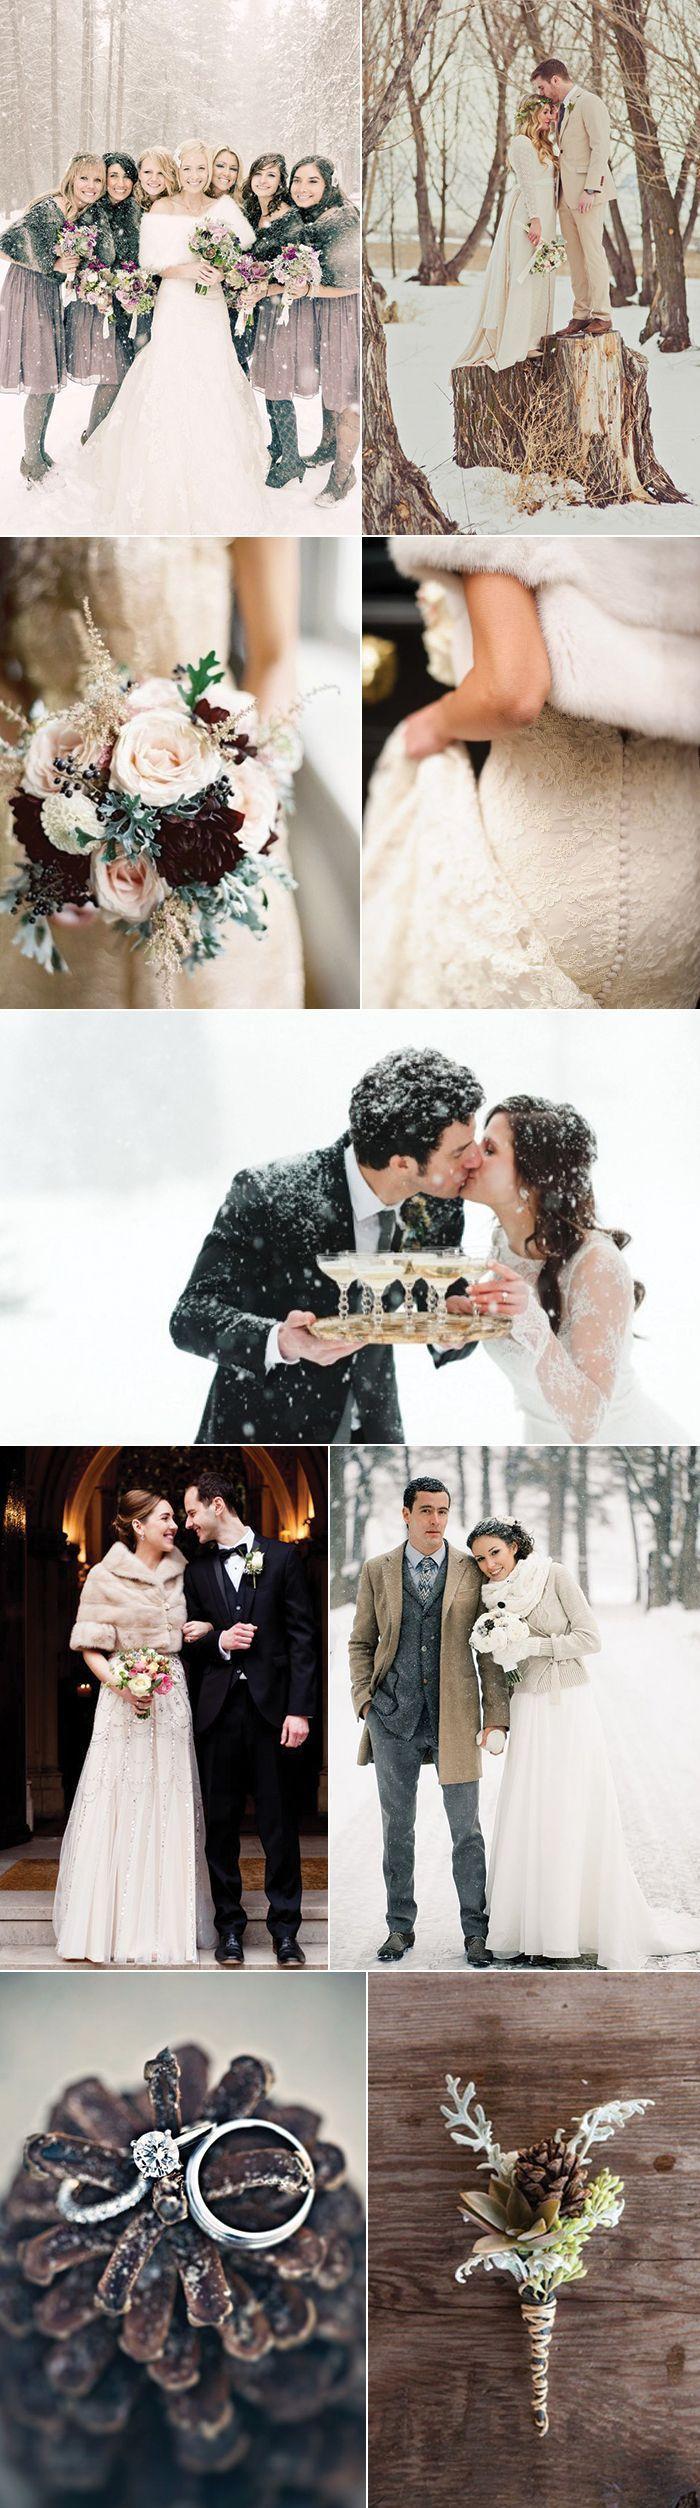 #Winter #Wedding Inspiration Board.